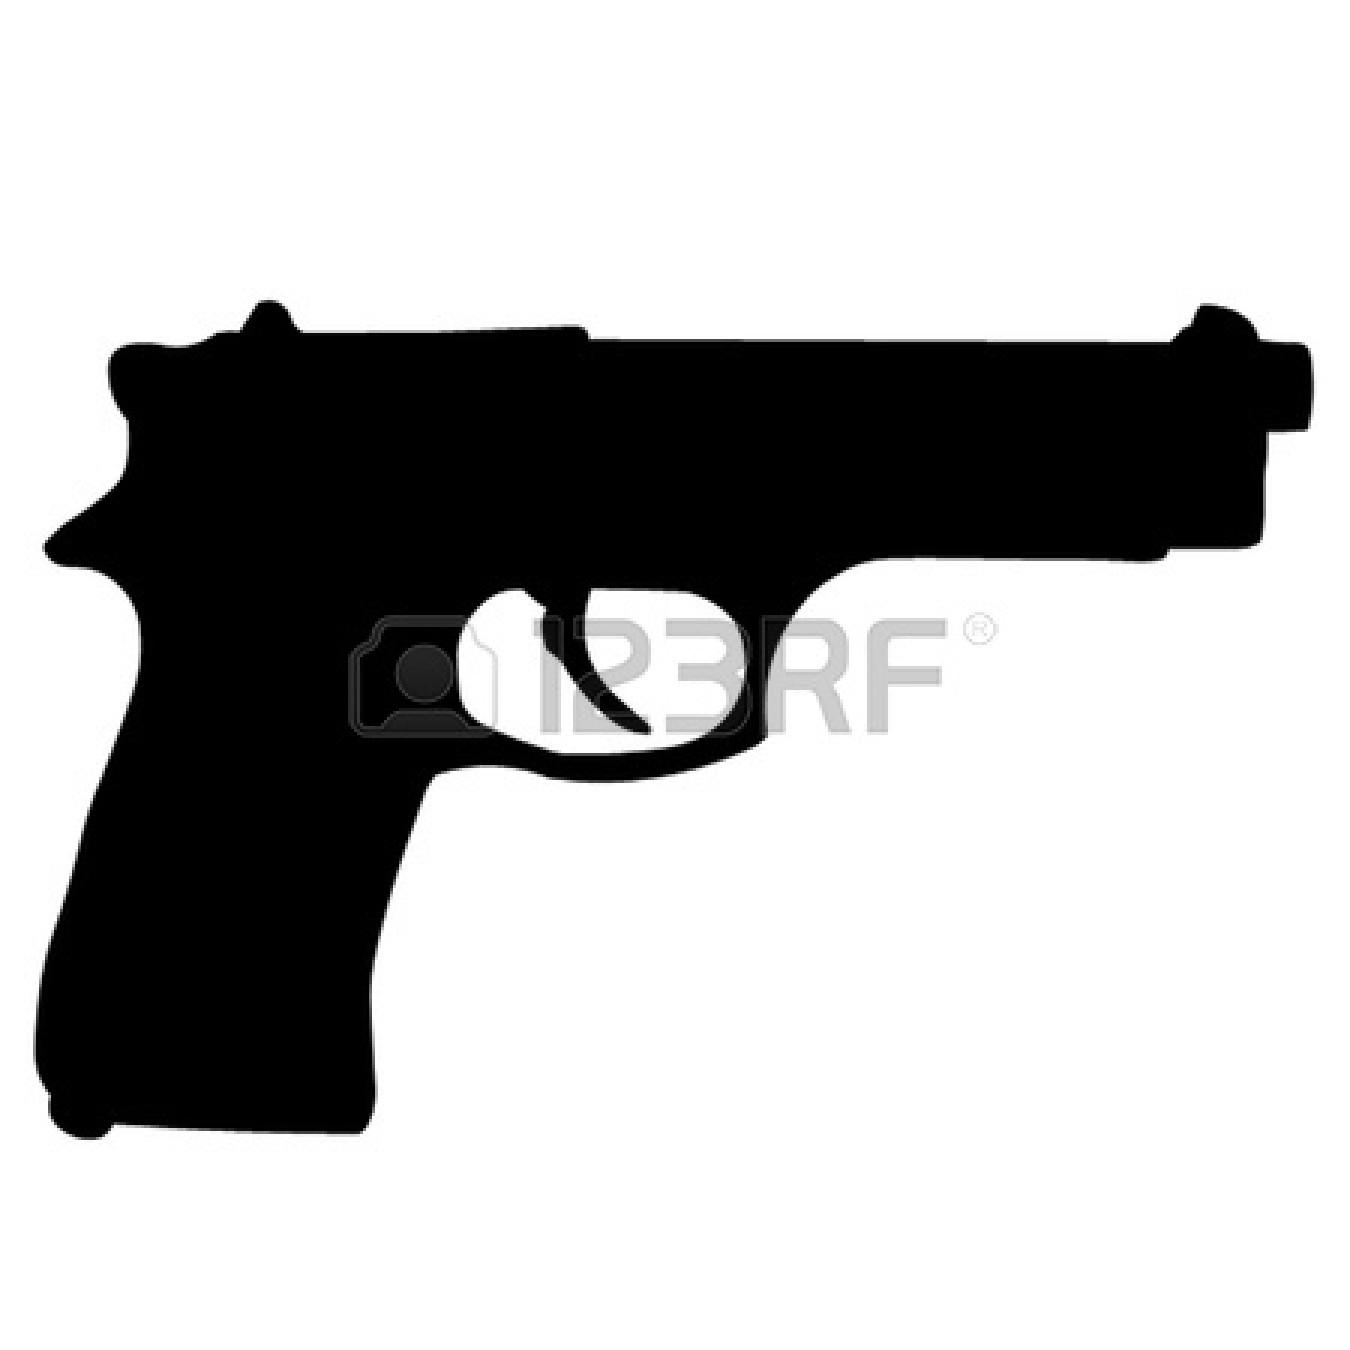 . Clipart gun